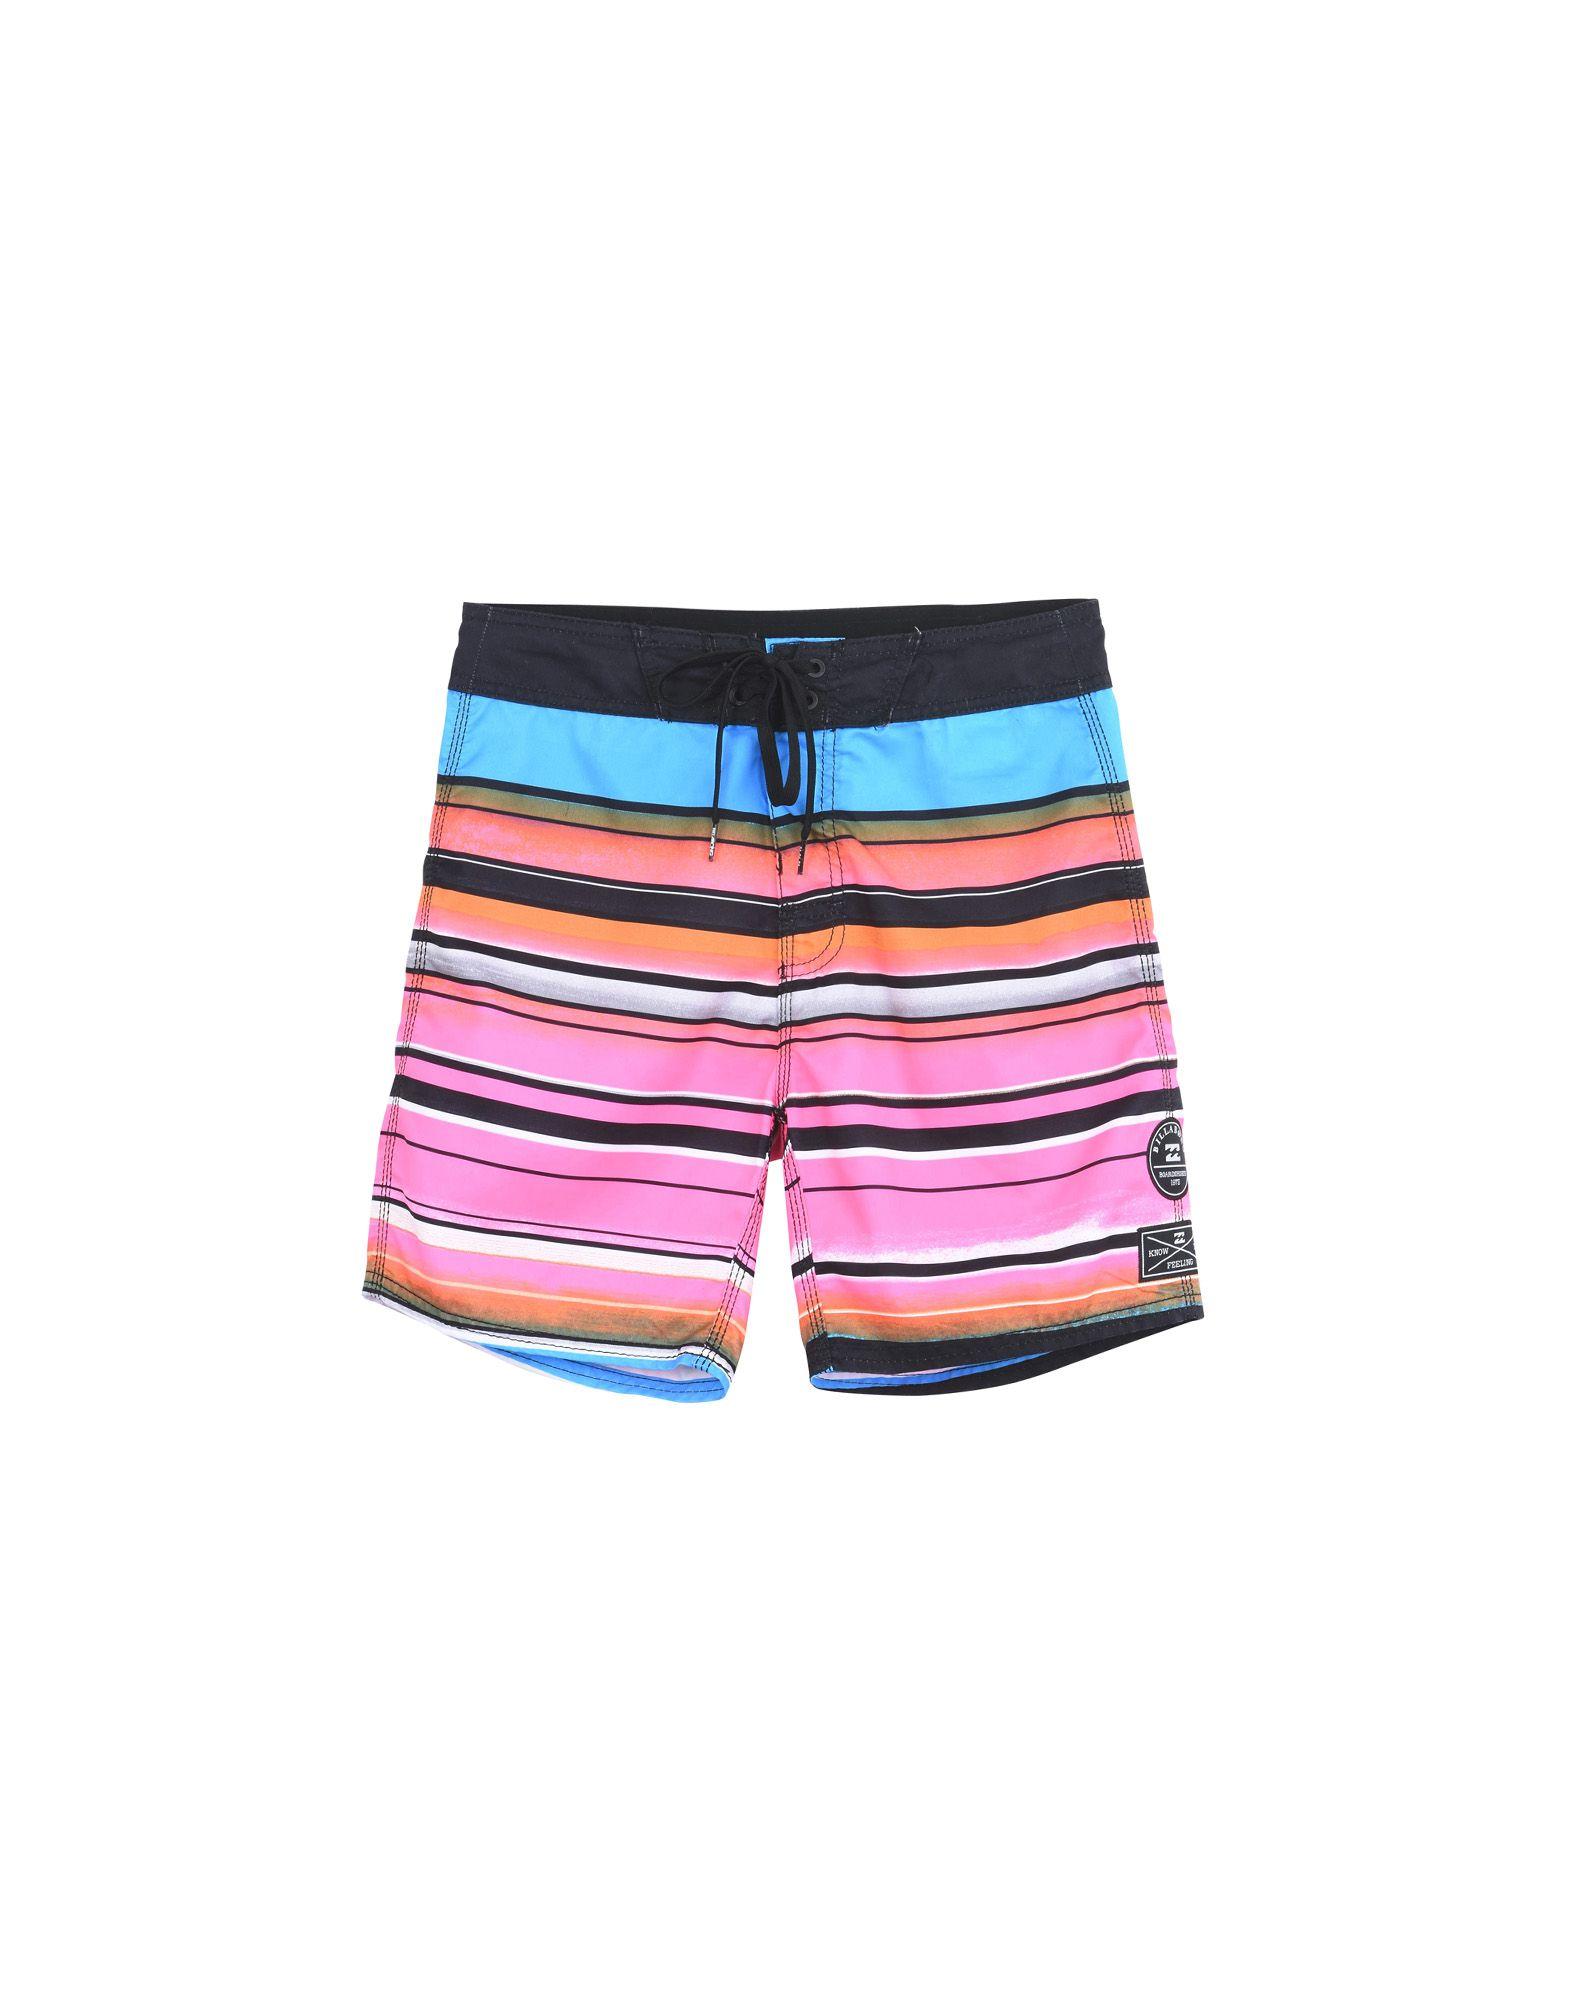 BILLABONG Пляжные брюки и шорты шорты пляжные детские billabong all day cut og 15 aqua